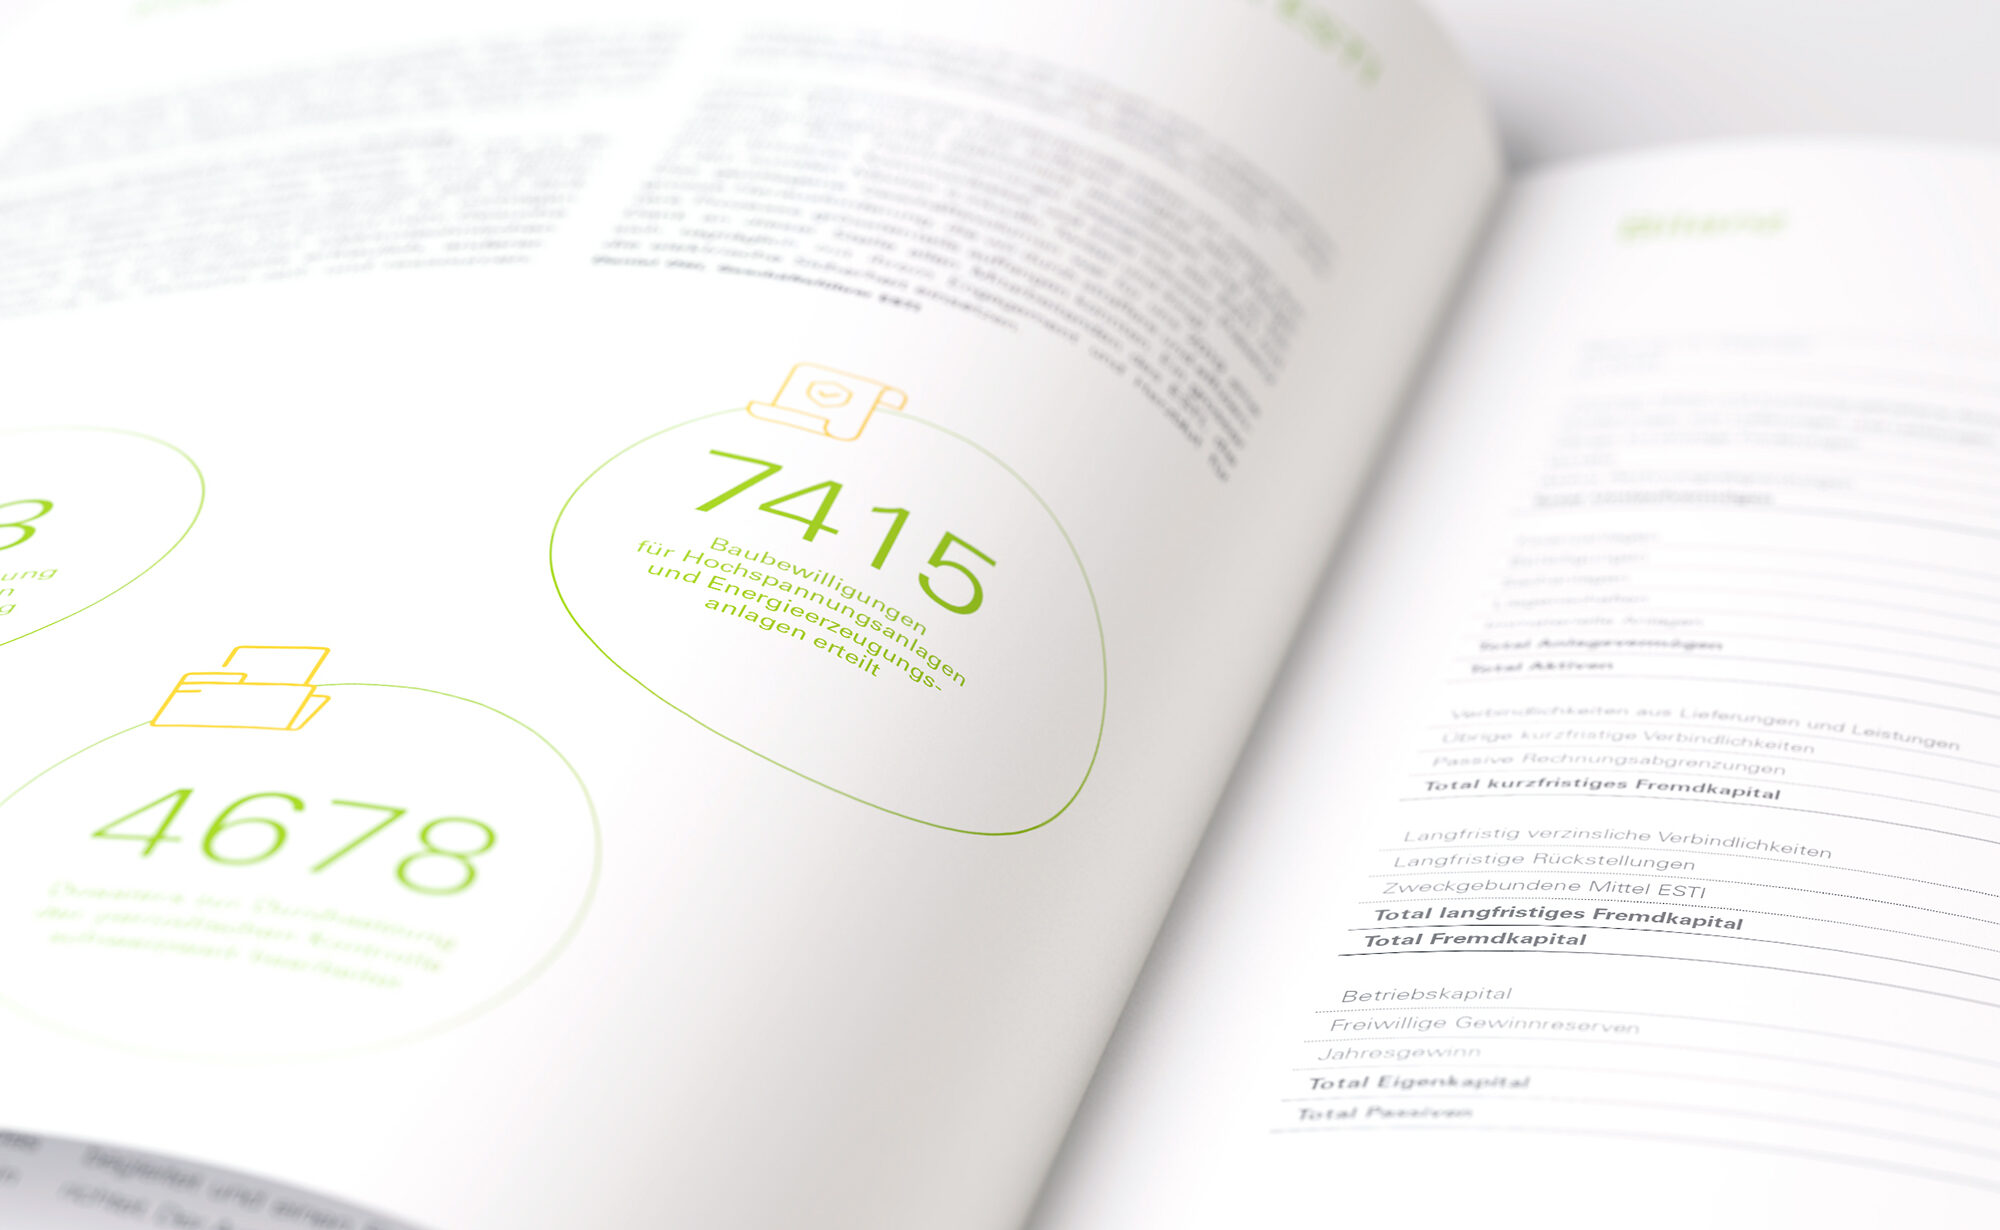 ESTI - Electrosuisse Jahresberichte, Agentur Schmucki